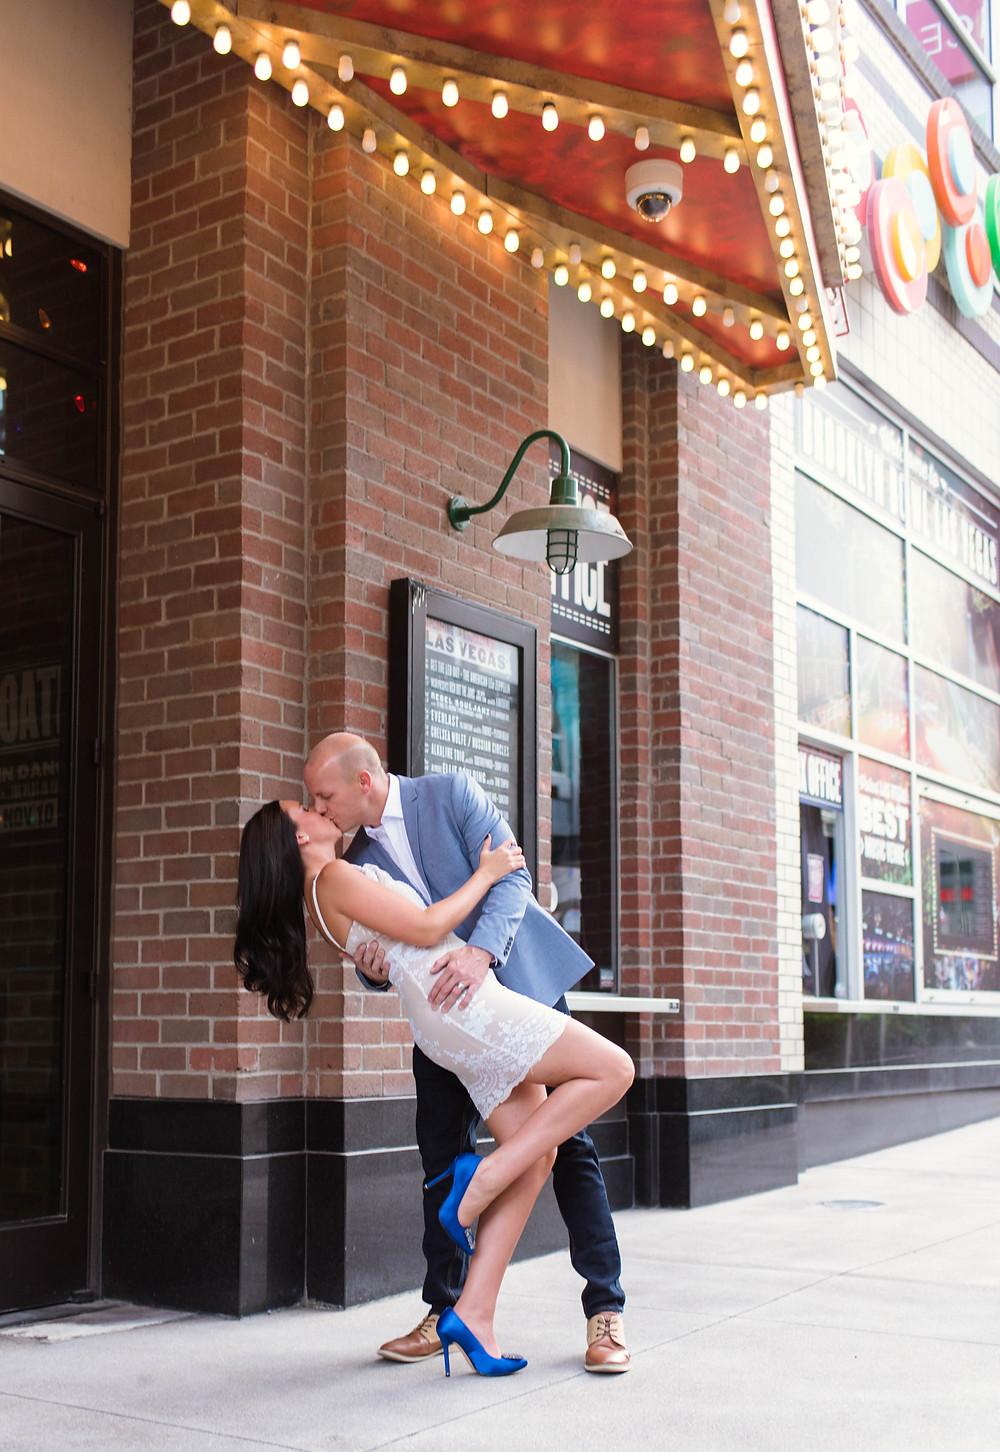 las vegas wedding, las vegas wedding photographers, anniversary photo session, las vegas, vegas weddings, vegas wedding photographer, anniversary photo session